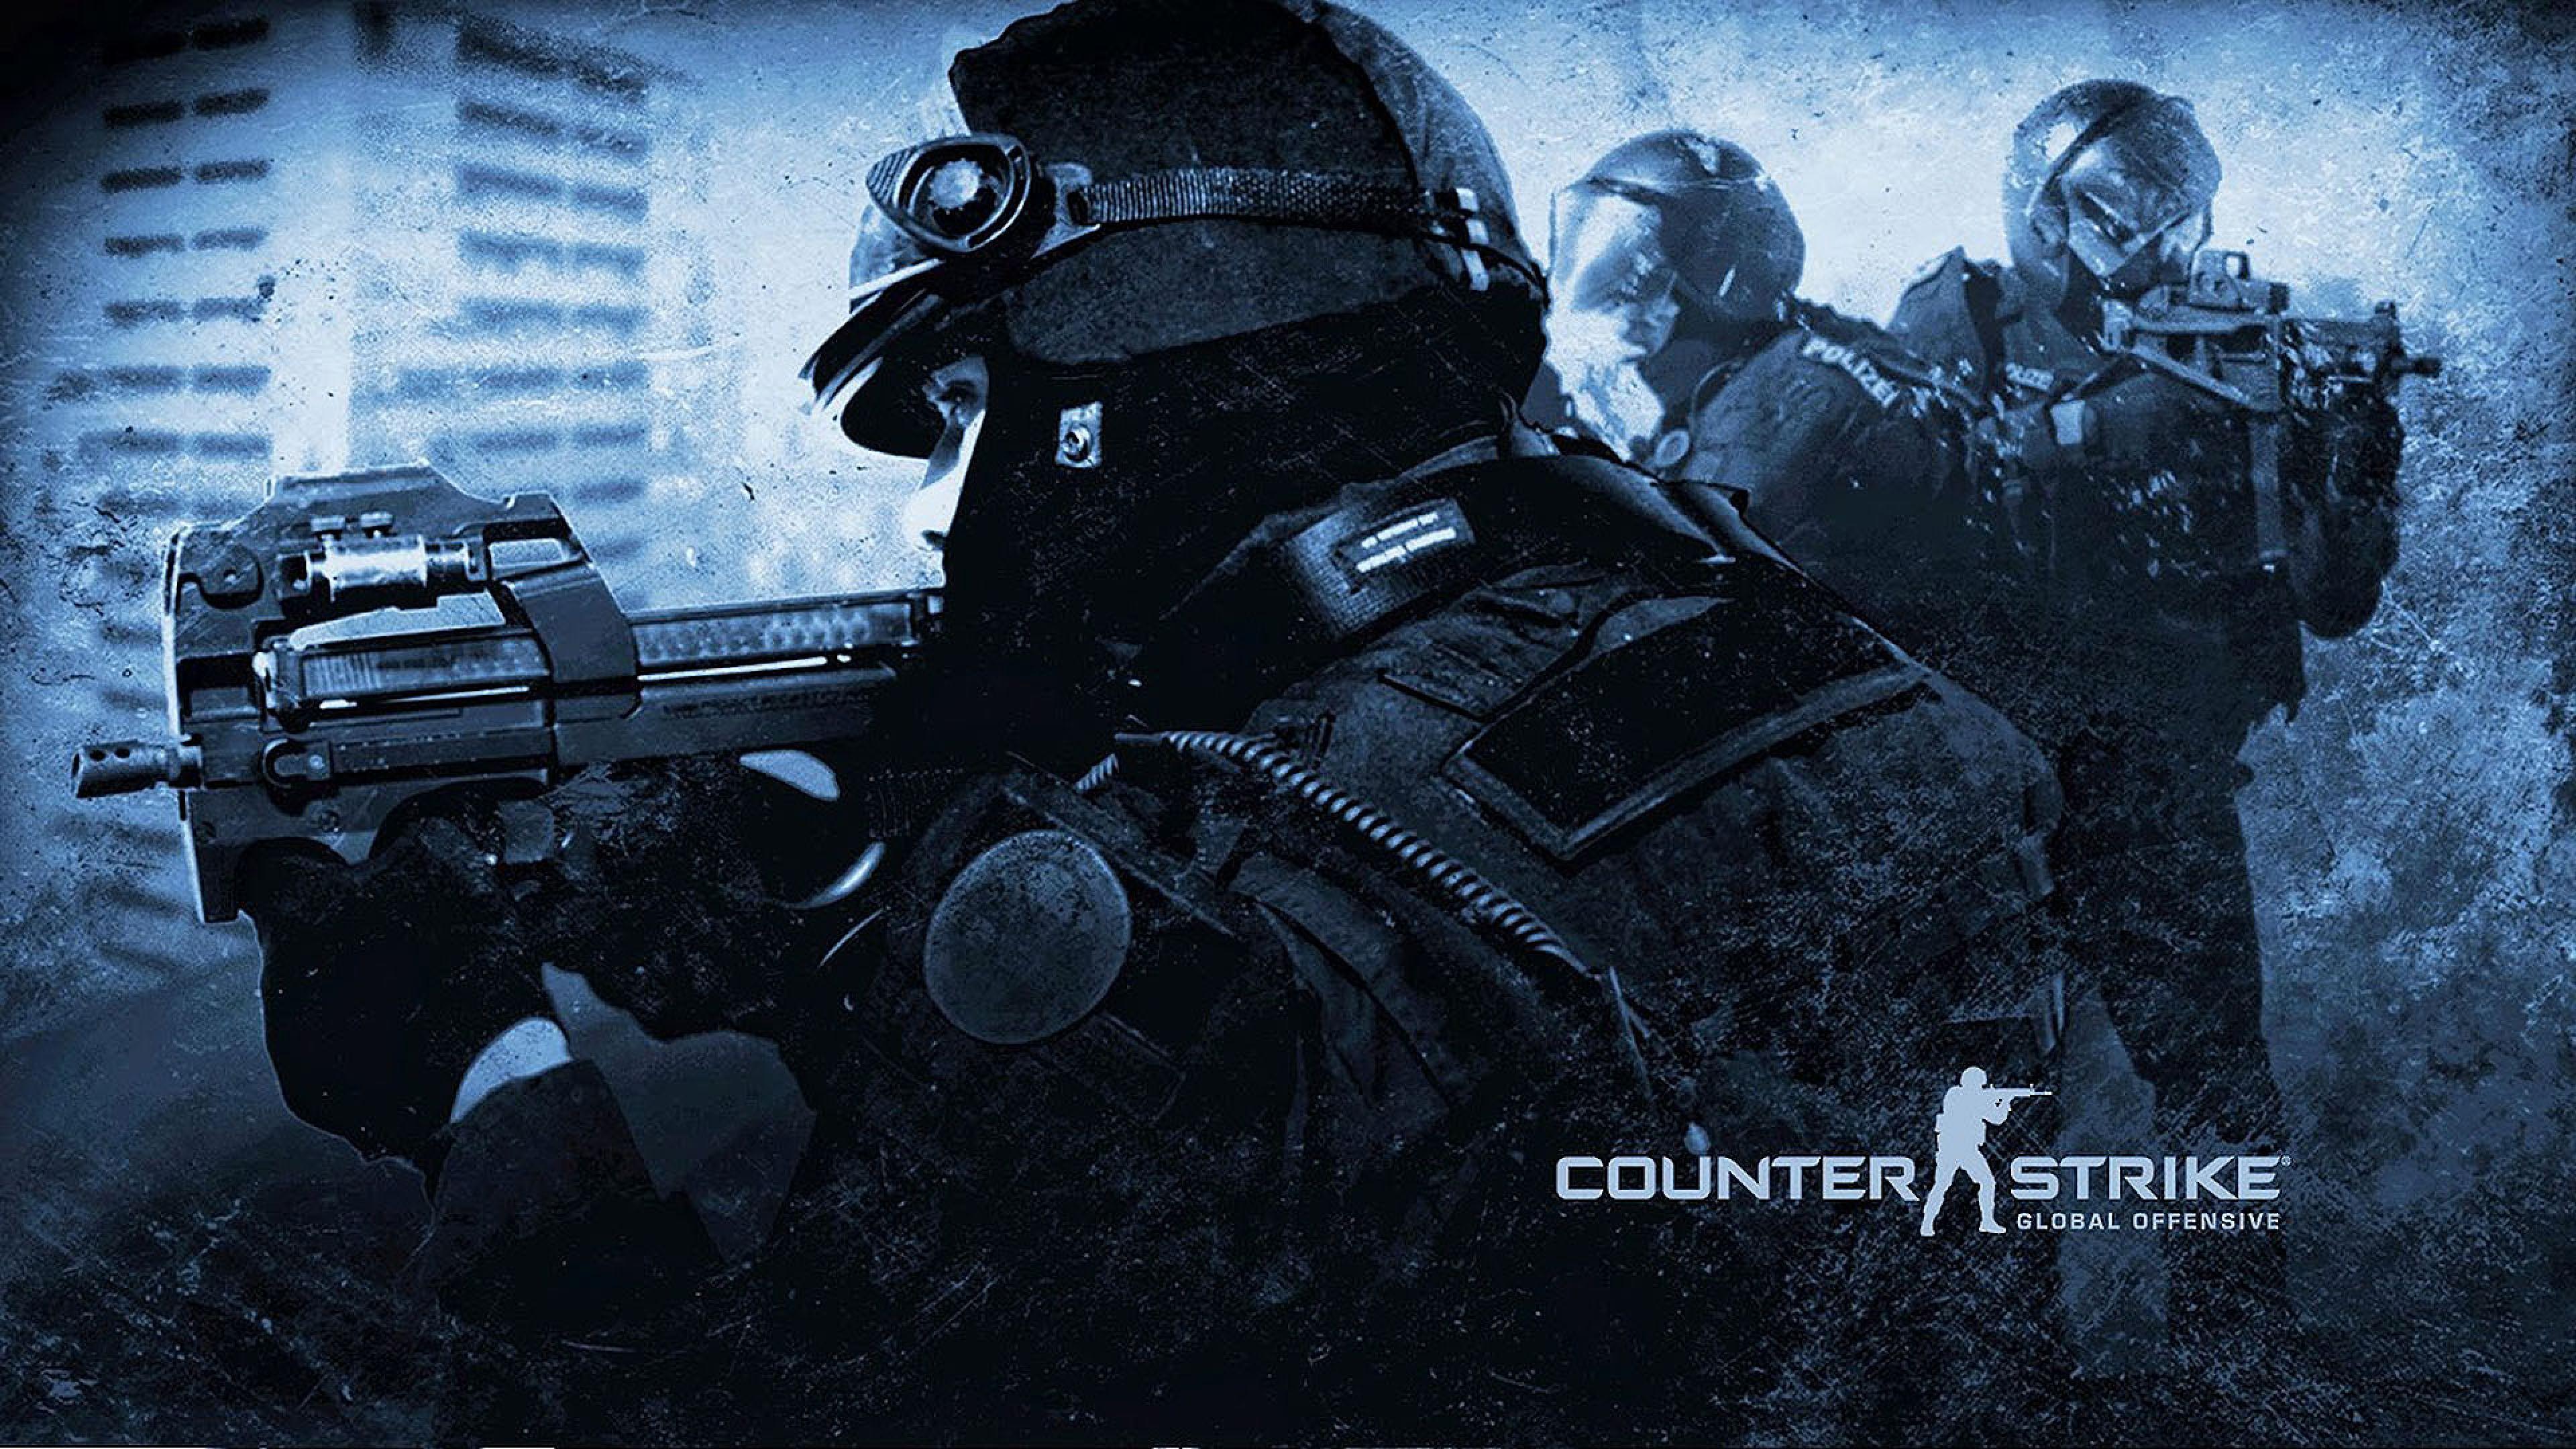 Counter Strike Counter Strike Global Offensive Game Cg Games Art 4k Wallpaper Hdwallpaper Desktop Game Art Go Wallpaper Cute Characters